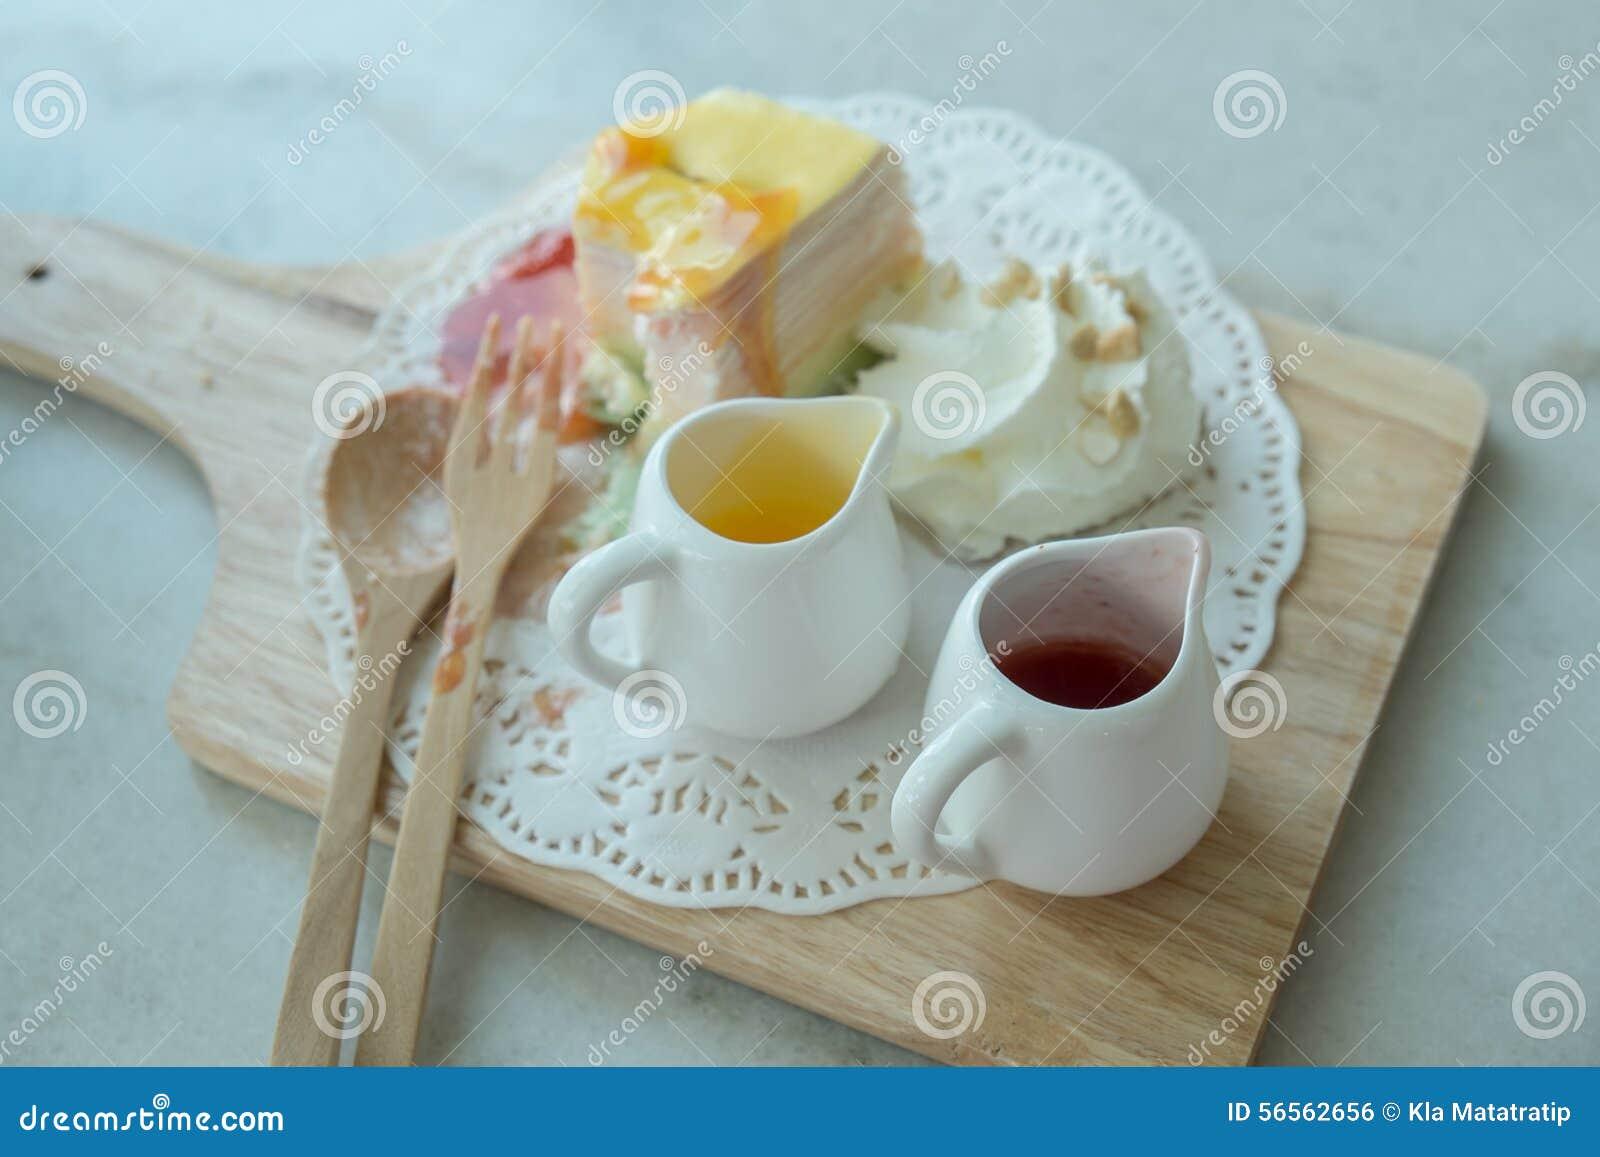 Download Το ουράνιο τόξο Crepe το κέικ στο Mable πίνακα Στοκ Εικόνες - εικόνα από σπιτικός, μαγείρεμα: 56562656